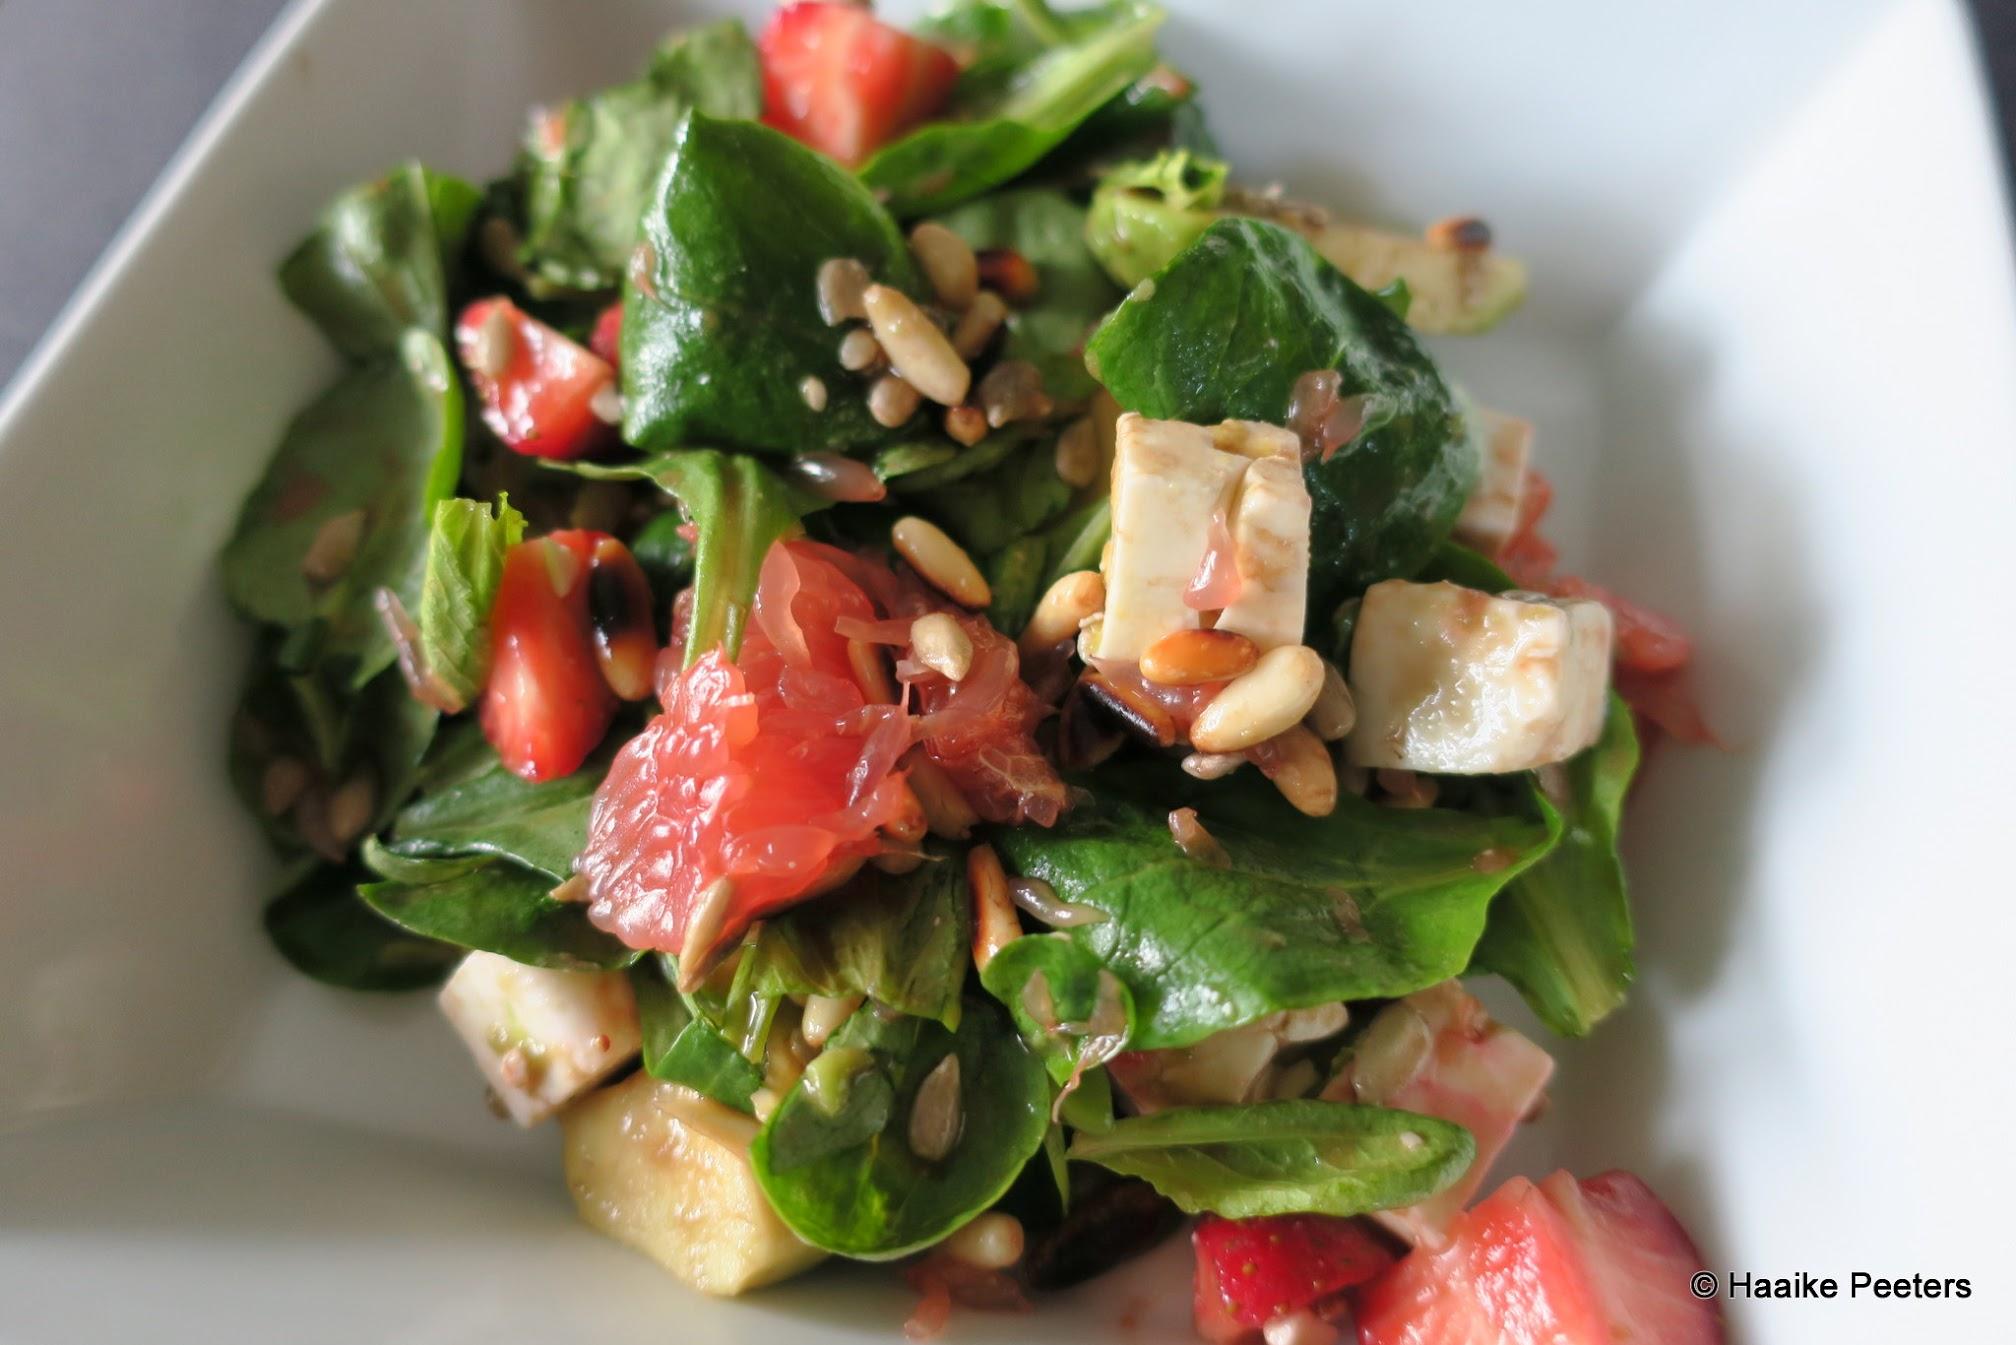 Salade met veldsalade, pompelmoes, aardbei en avocado (Le petit requin)